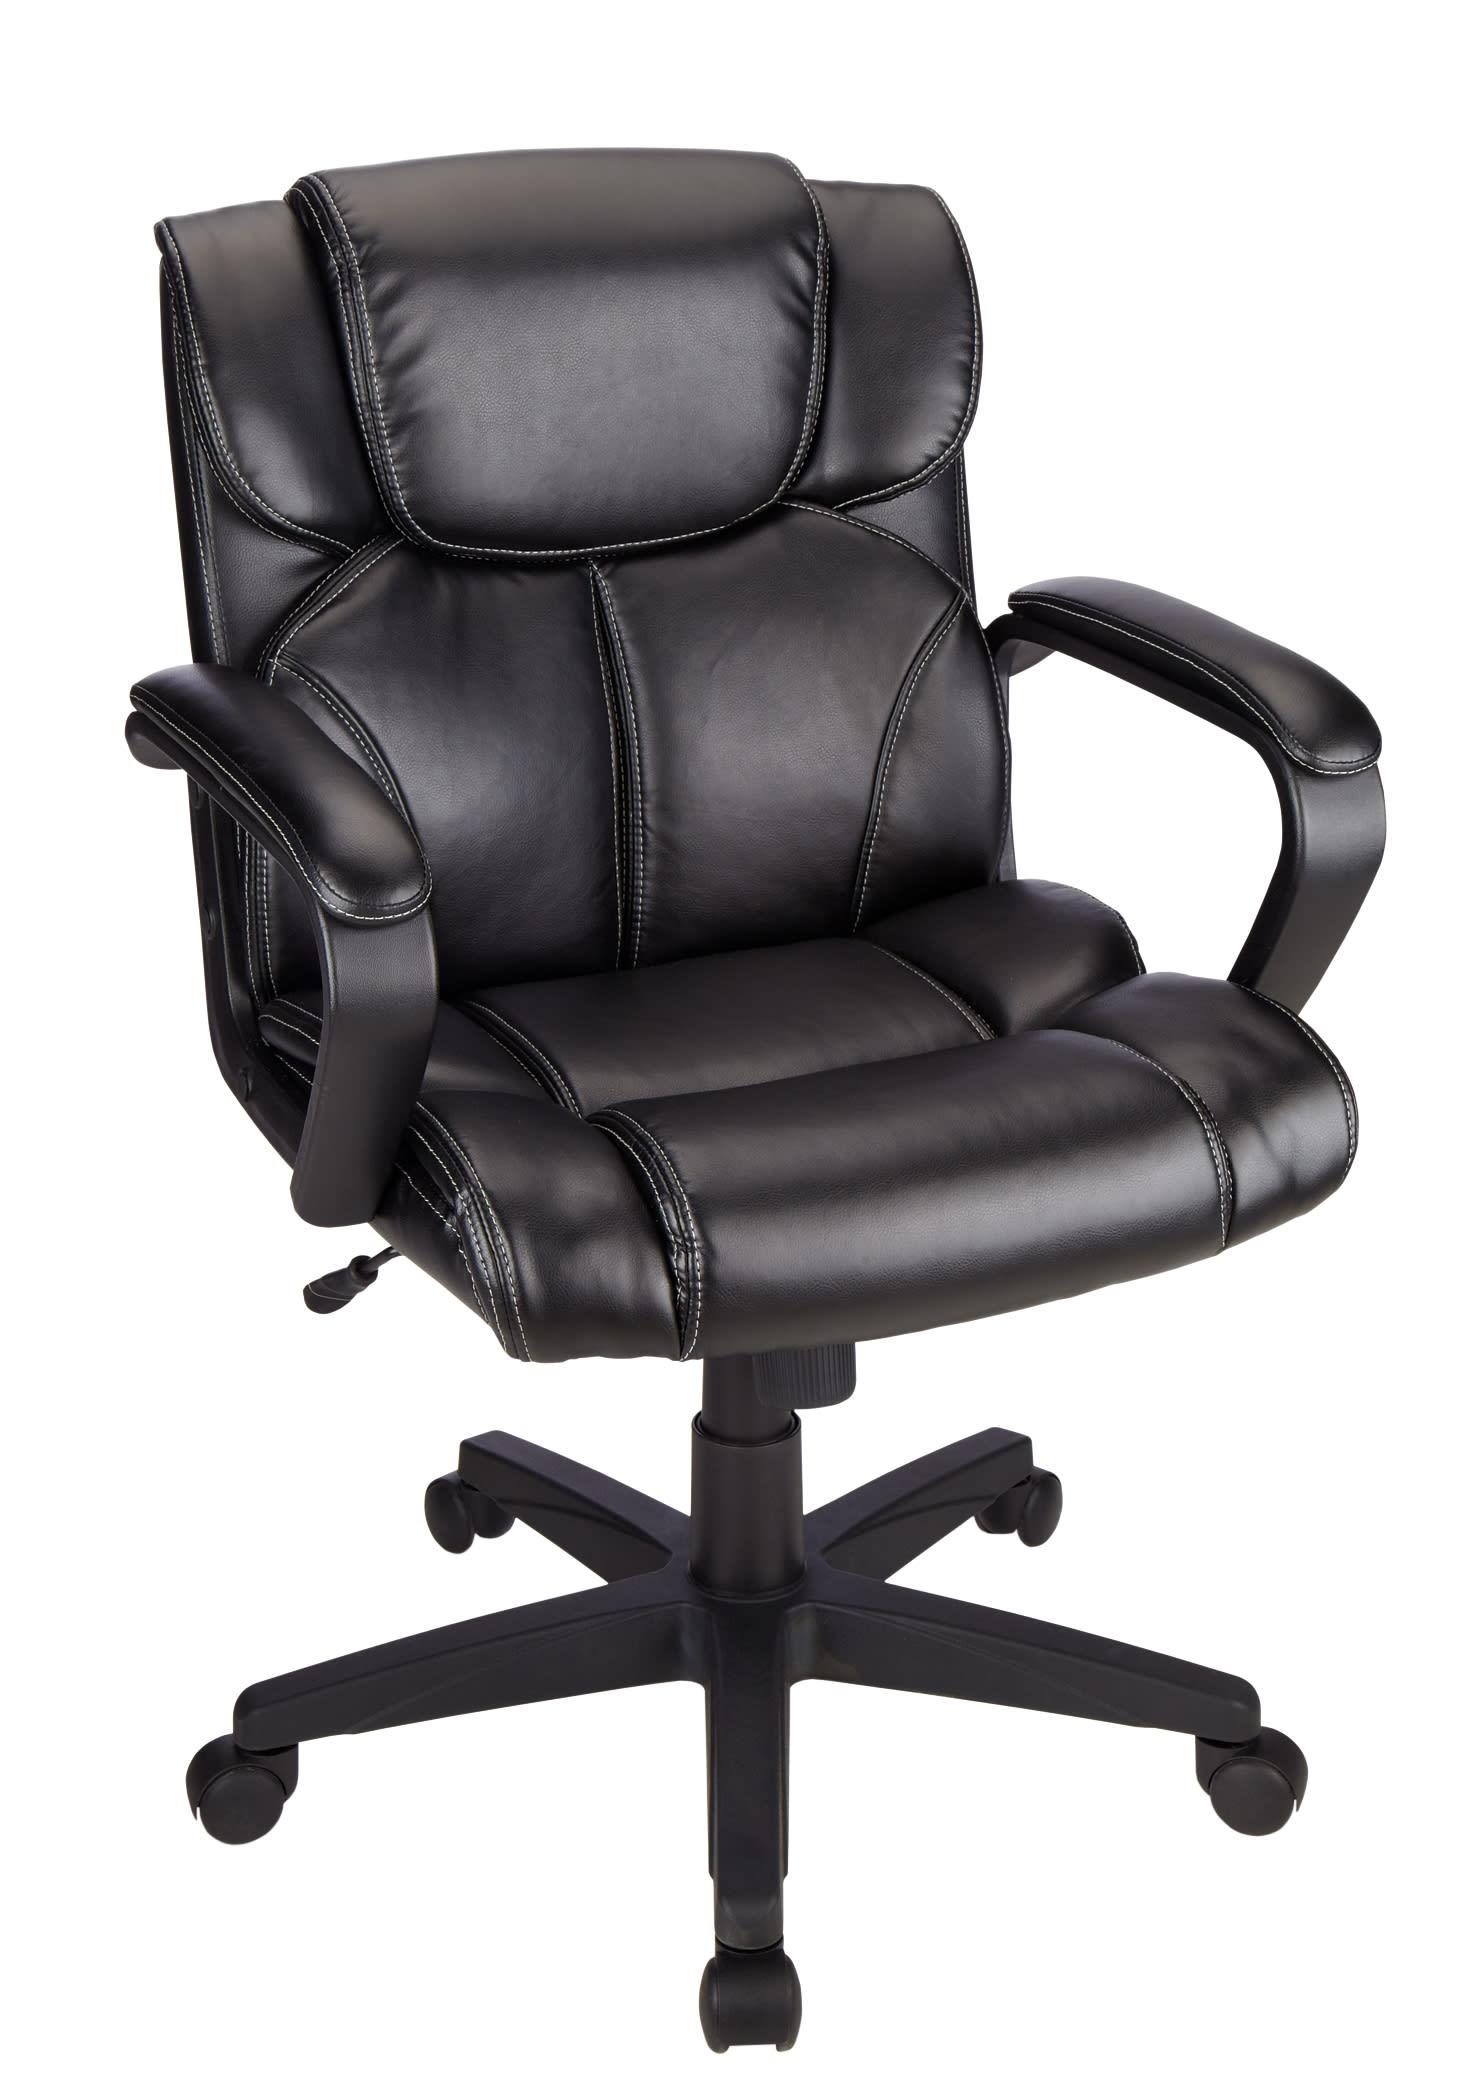 Brenton Studio® Briessa Mid-Back Chair, Black